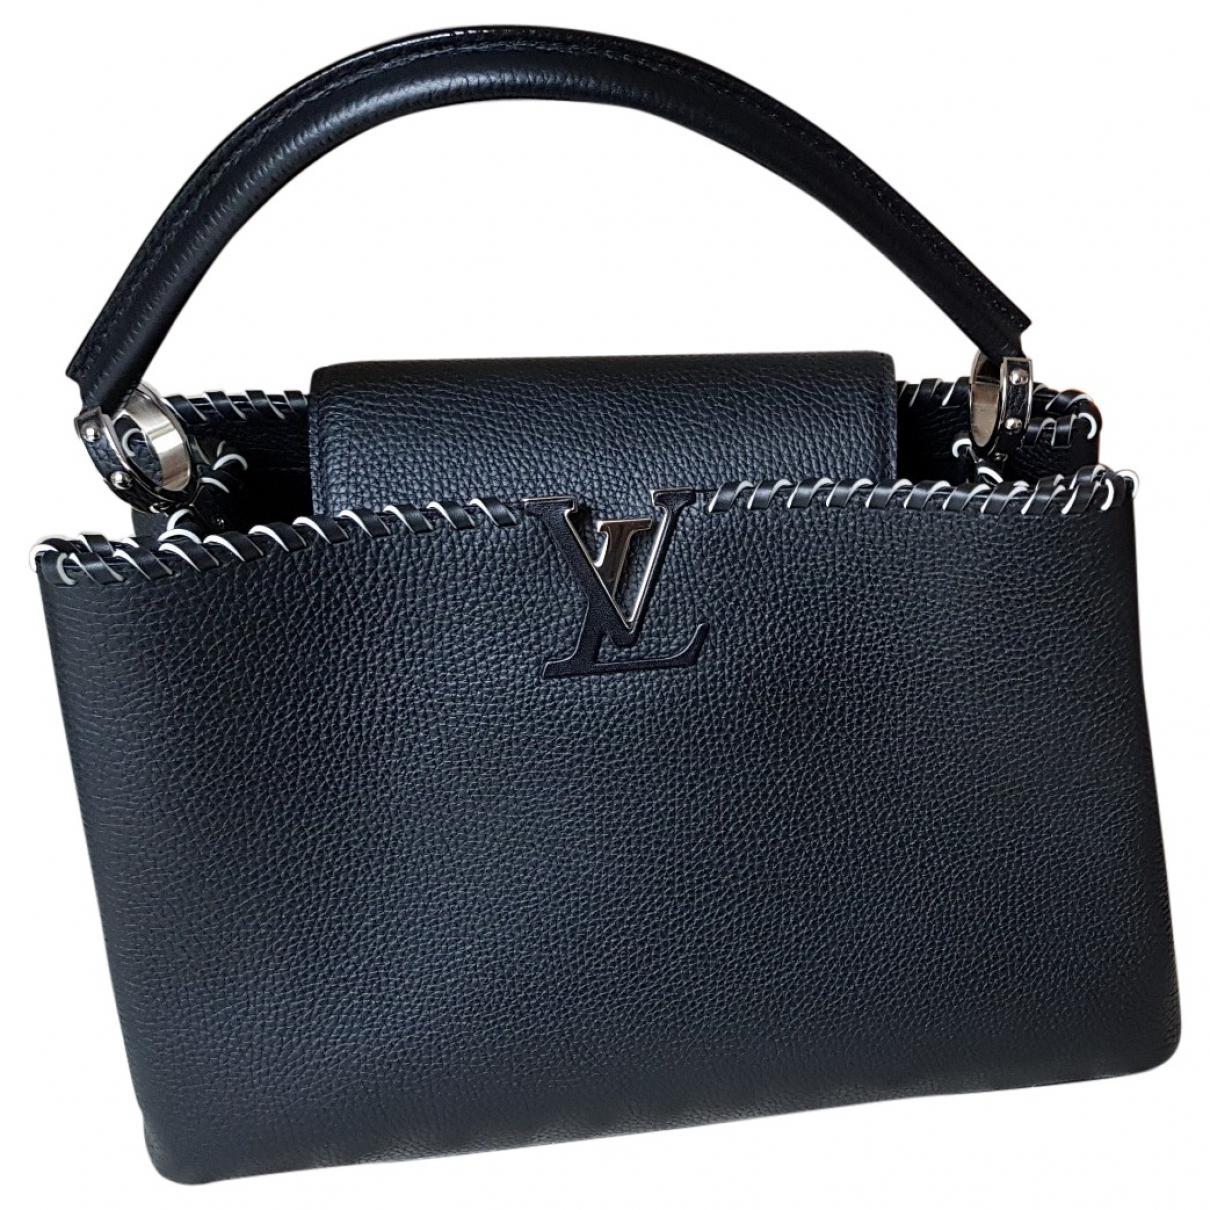 De Segunda Mano - Bolso De Cuero De Louis Vuitton Capucine sA6SgGdOFA